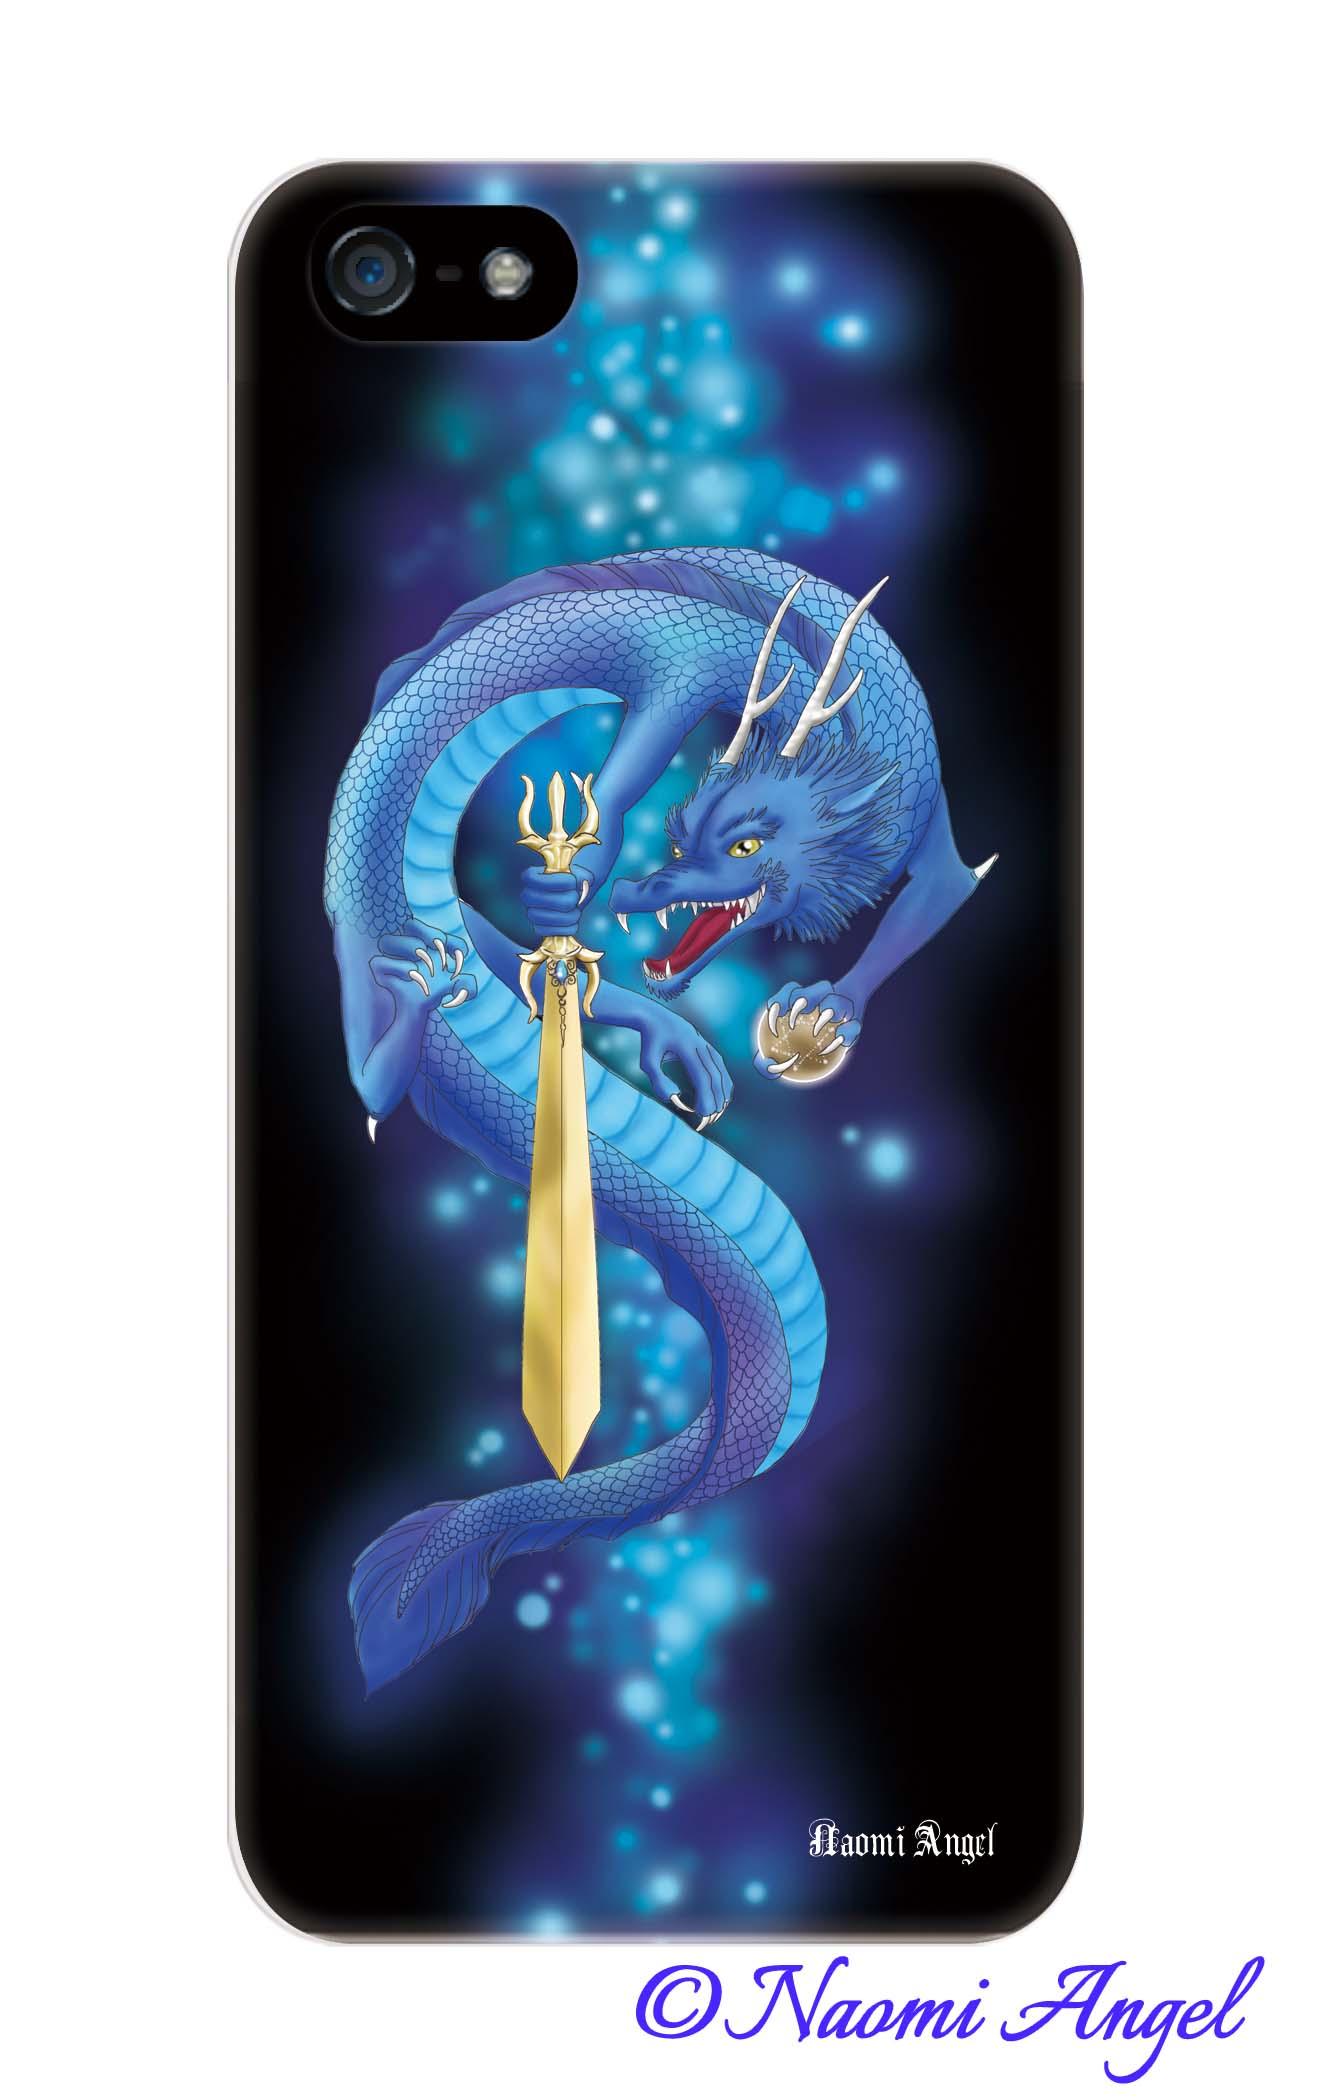 Naomi Angel オリジナルスマートフォンカバー ネット販売開始_f0186787_21195354.jpg